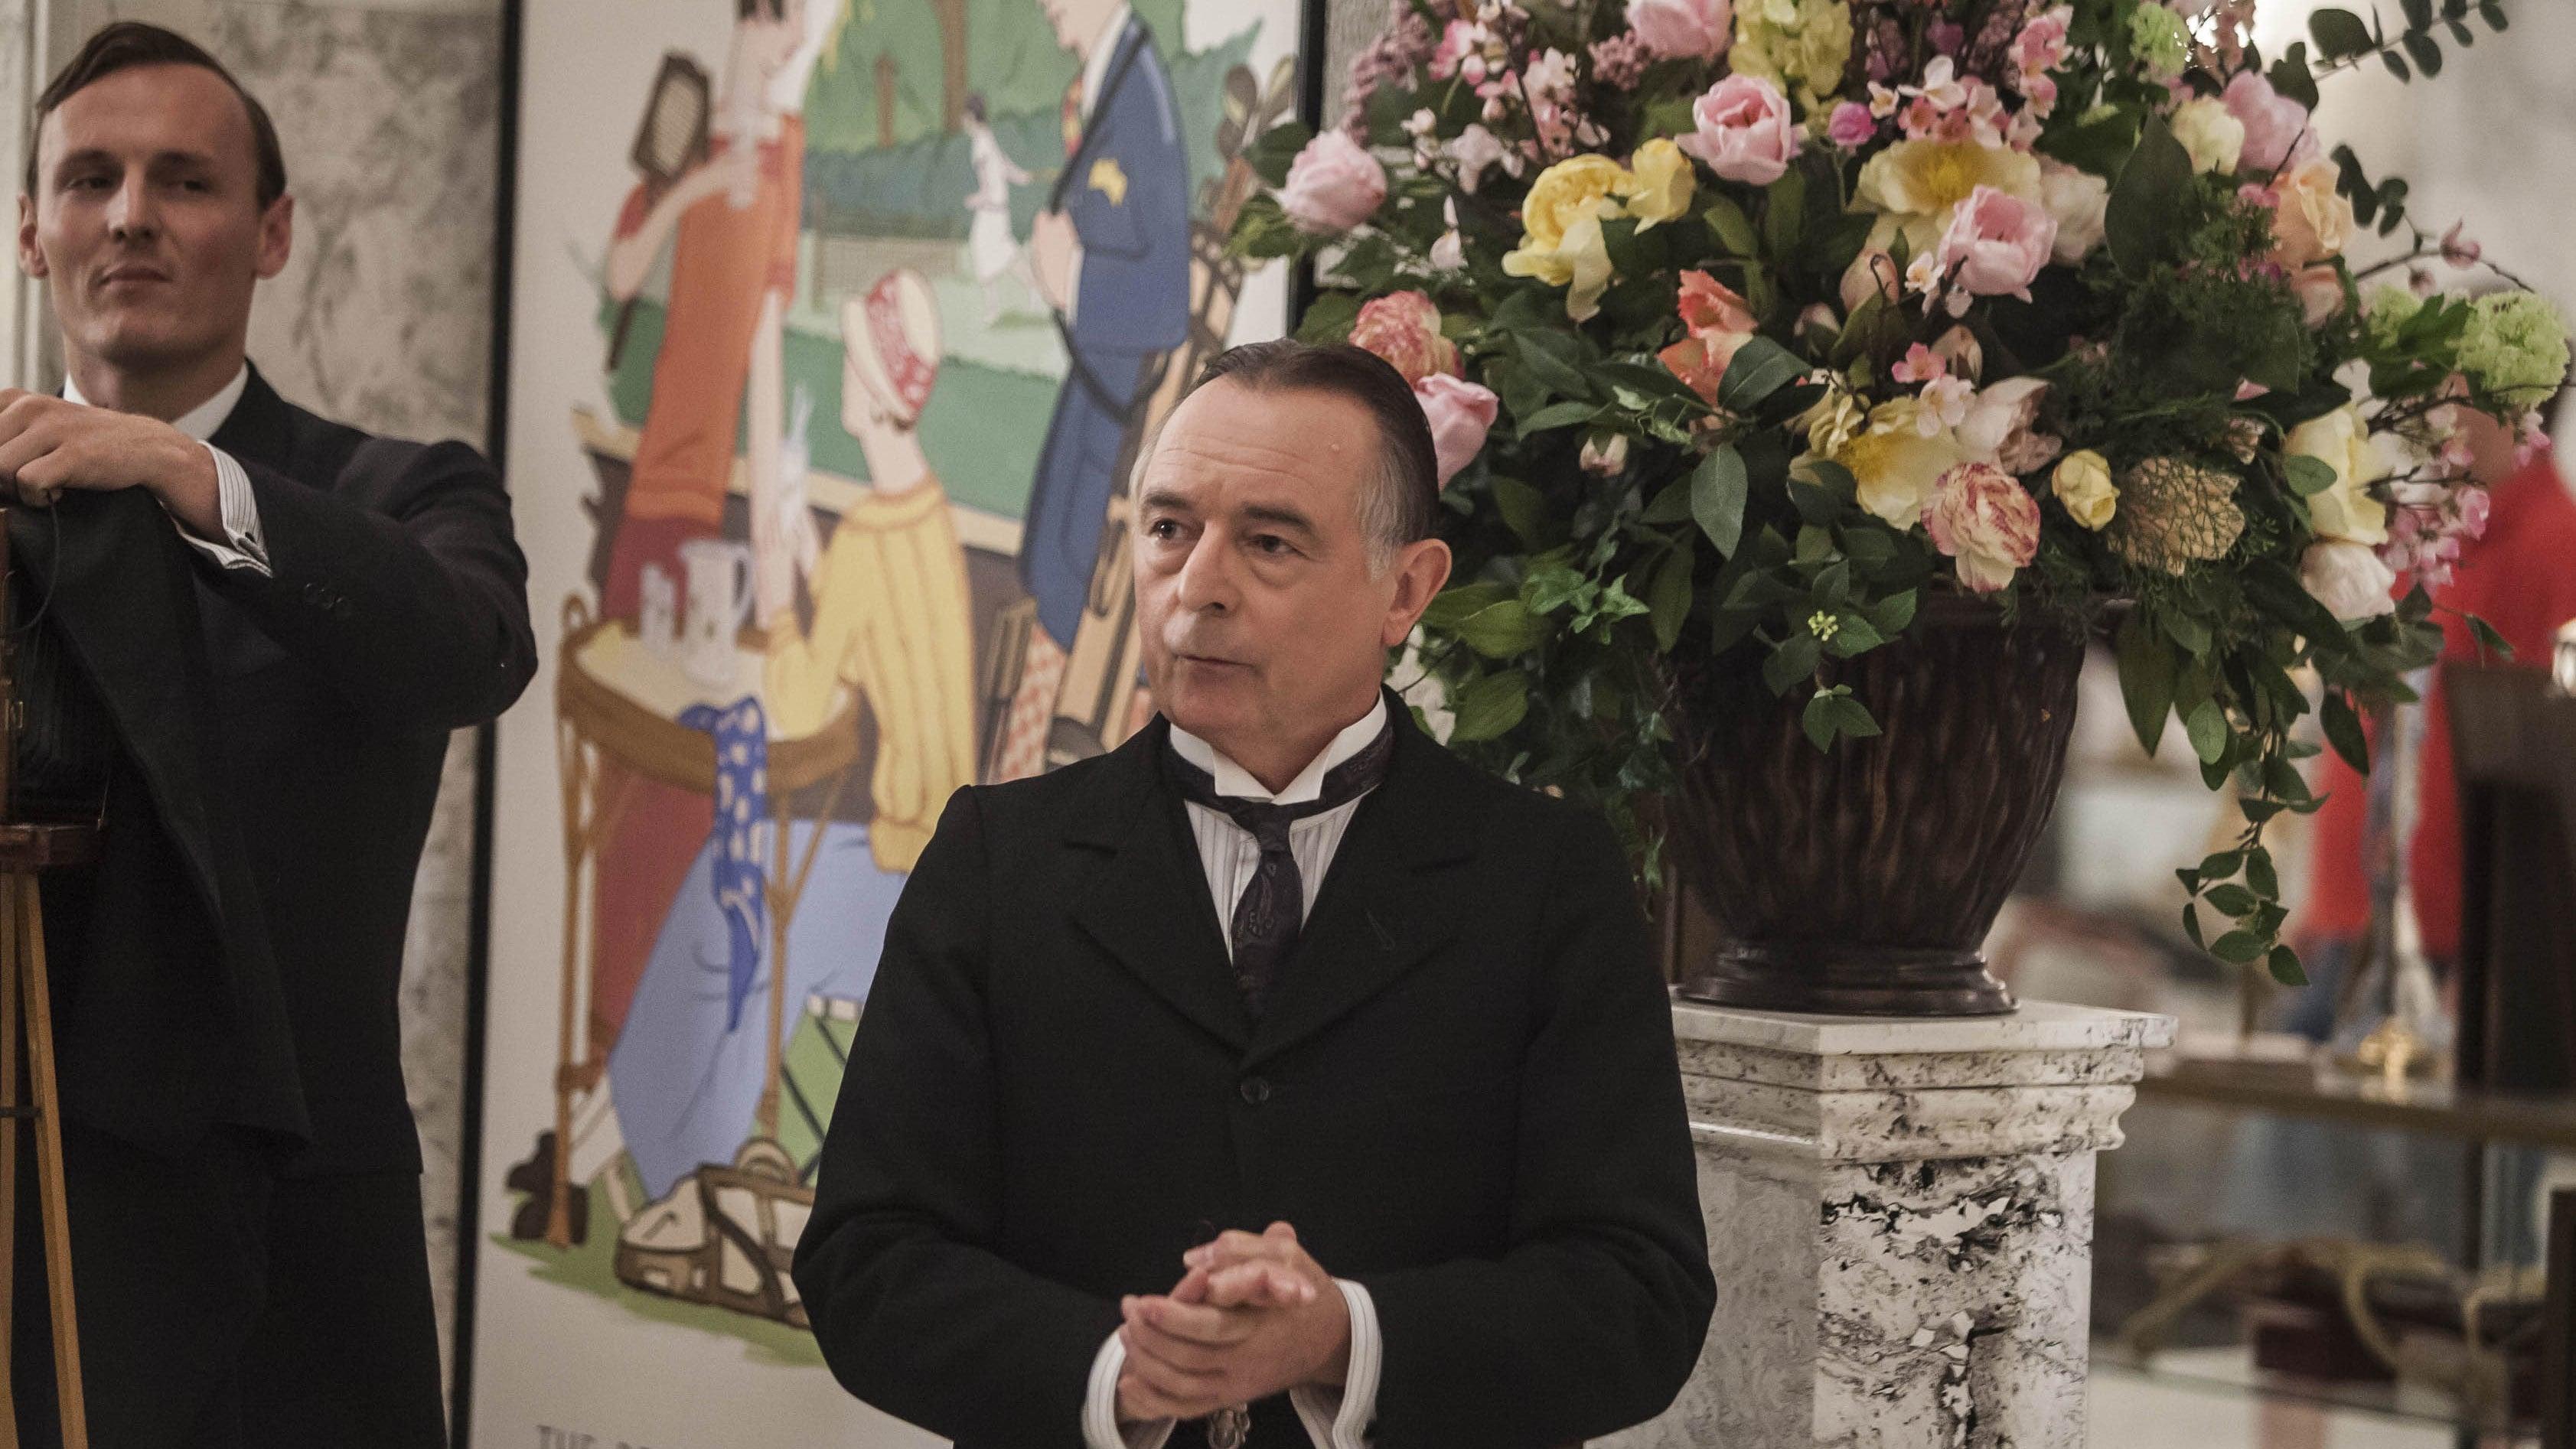 Mr Selfridge Season 3 X Episode 8 Free To Watch Online Tmovies